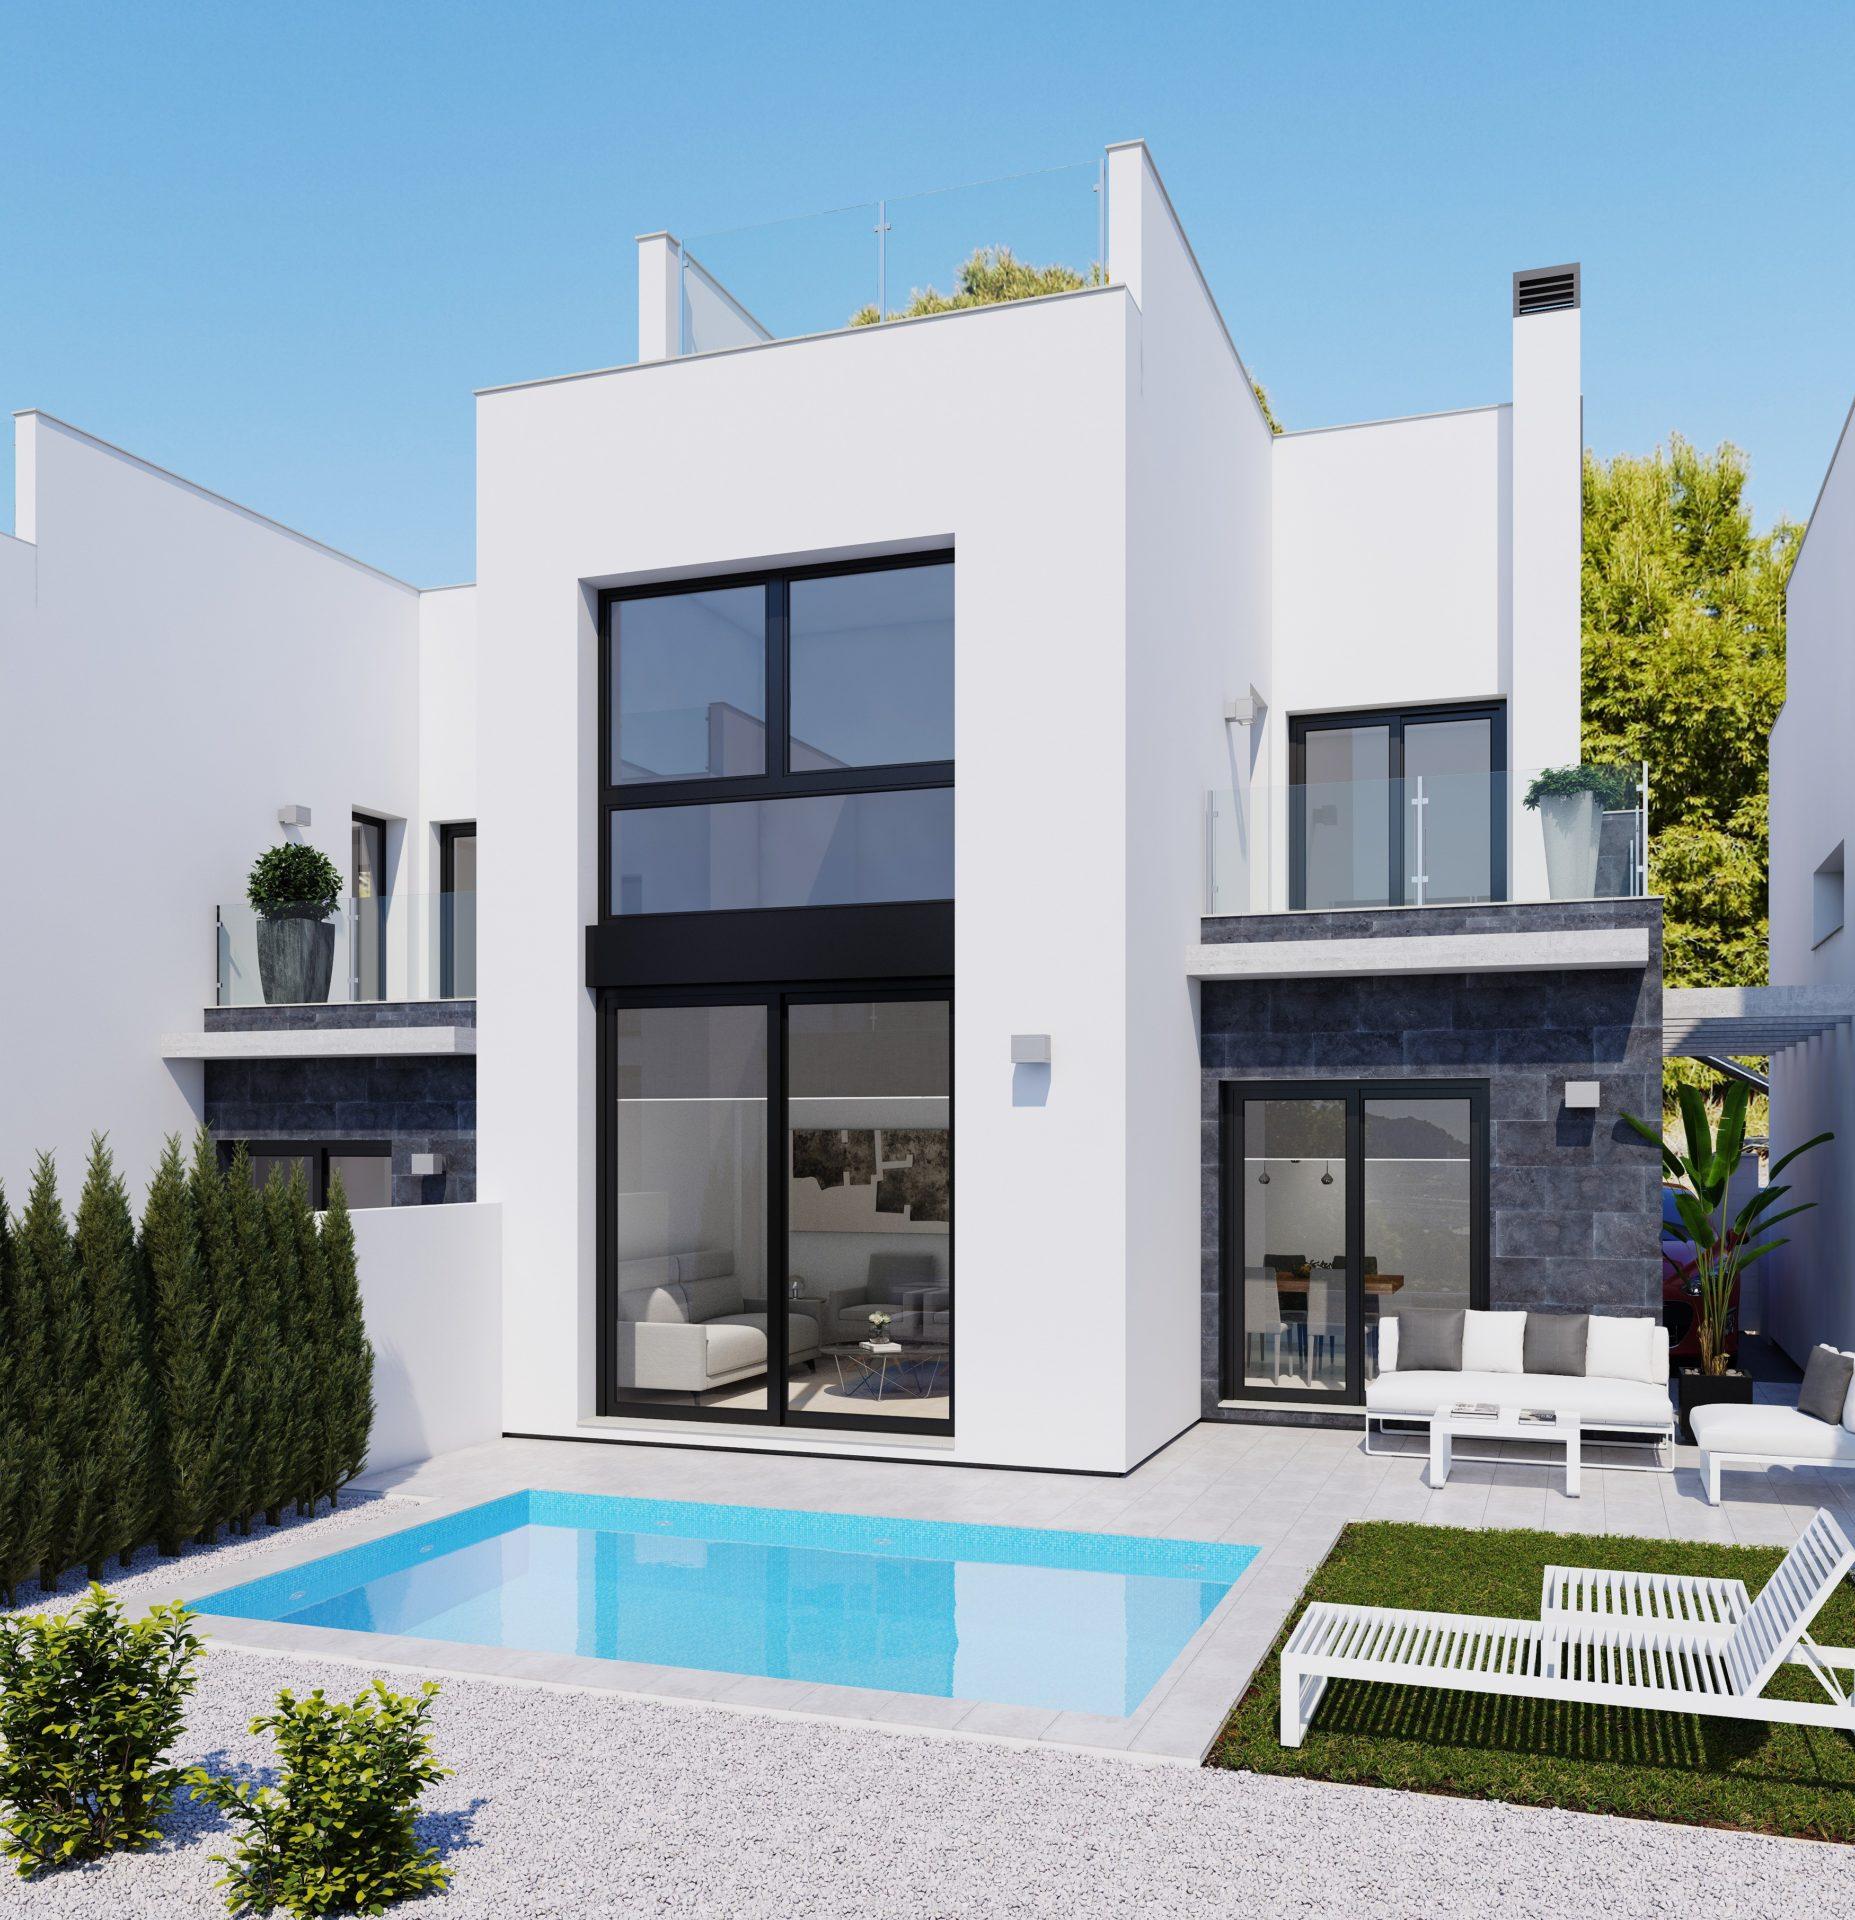 Tindra Homes El Mirador Phase 2 Villas